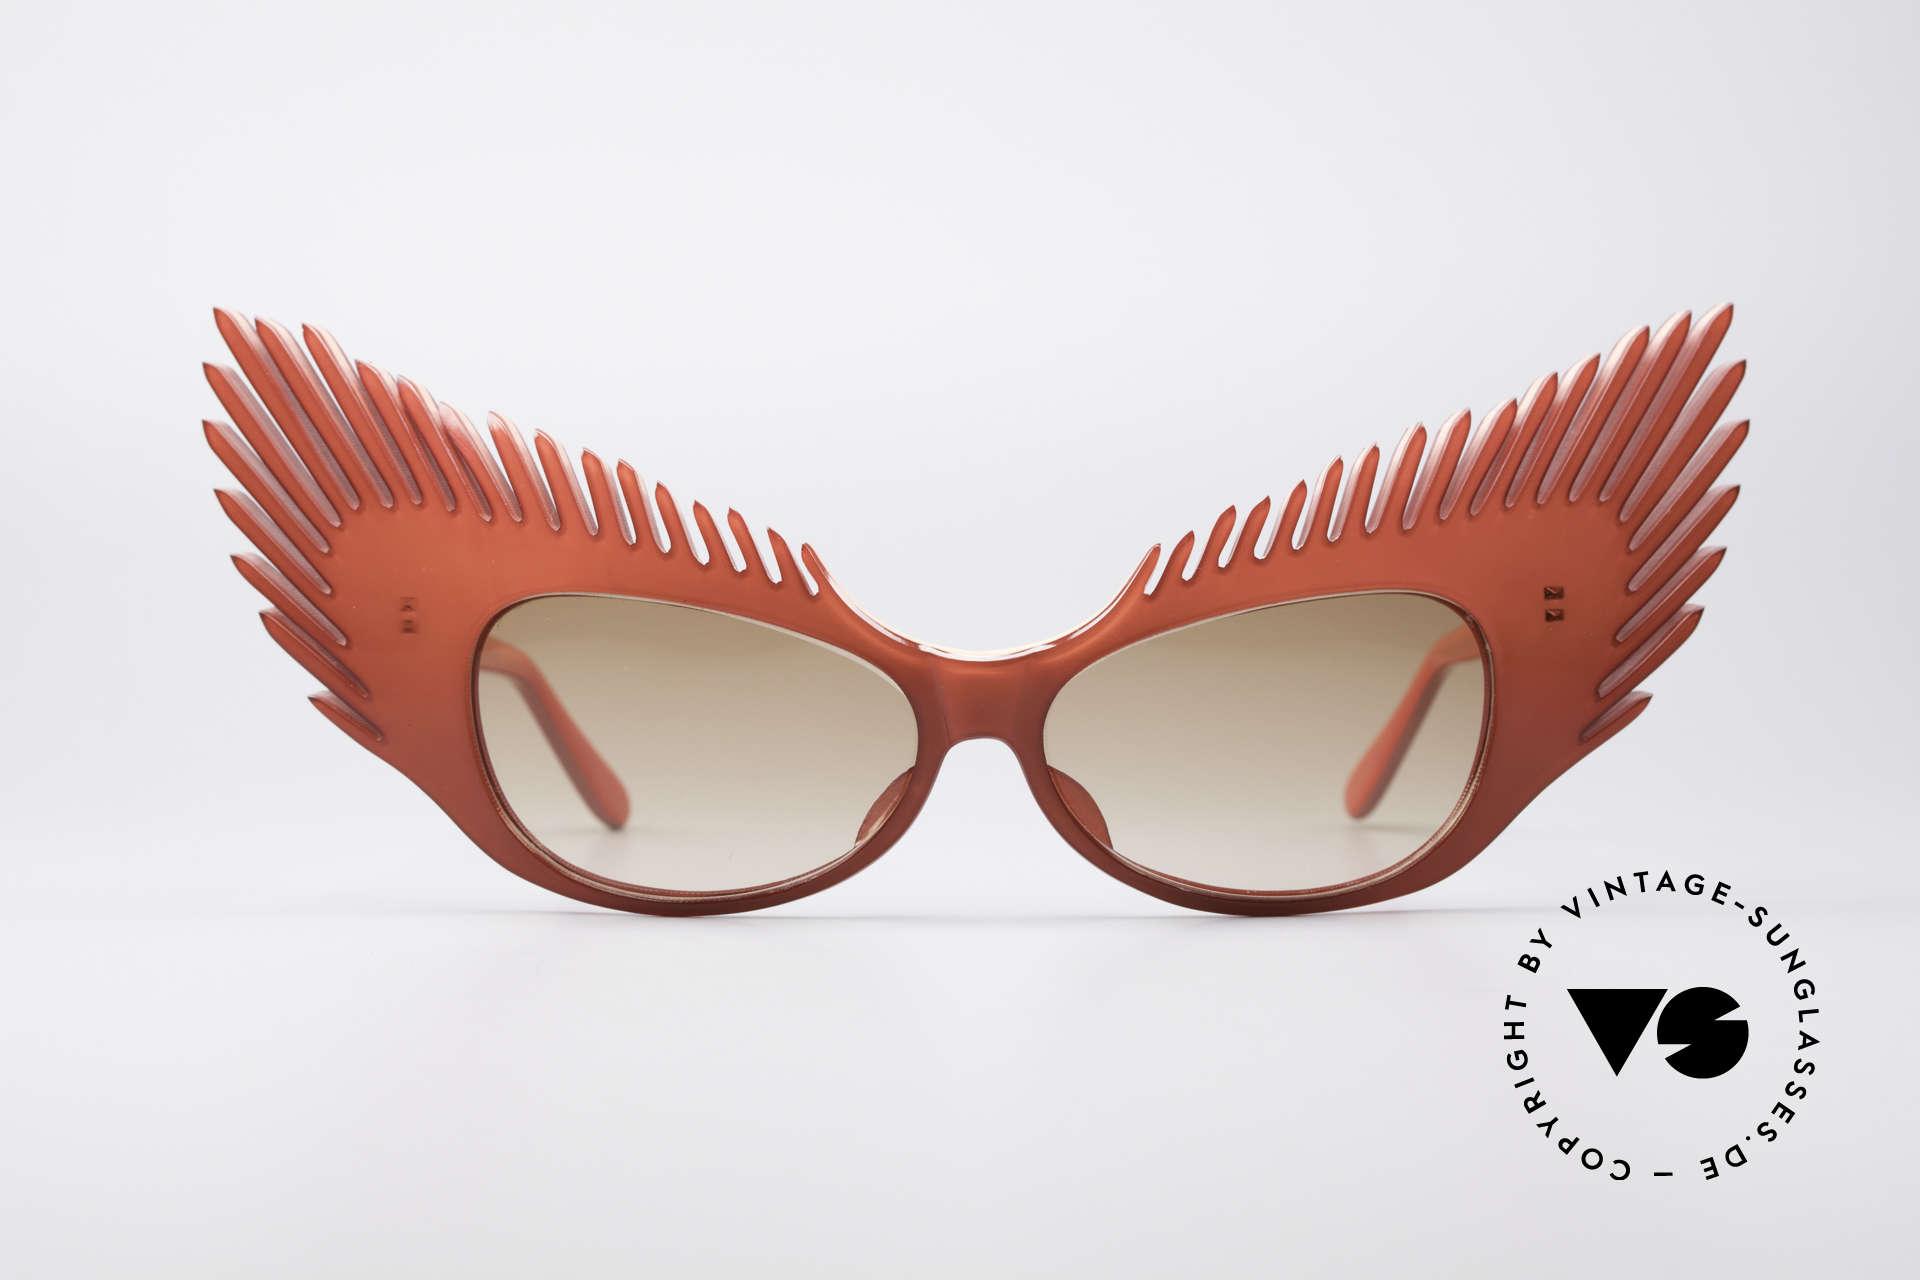 f647d37c4505 Sunglasses Alain Mikli MYSTERY Haute Couture Vintage Shades ...